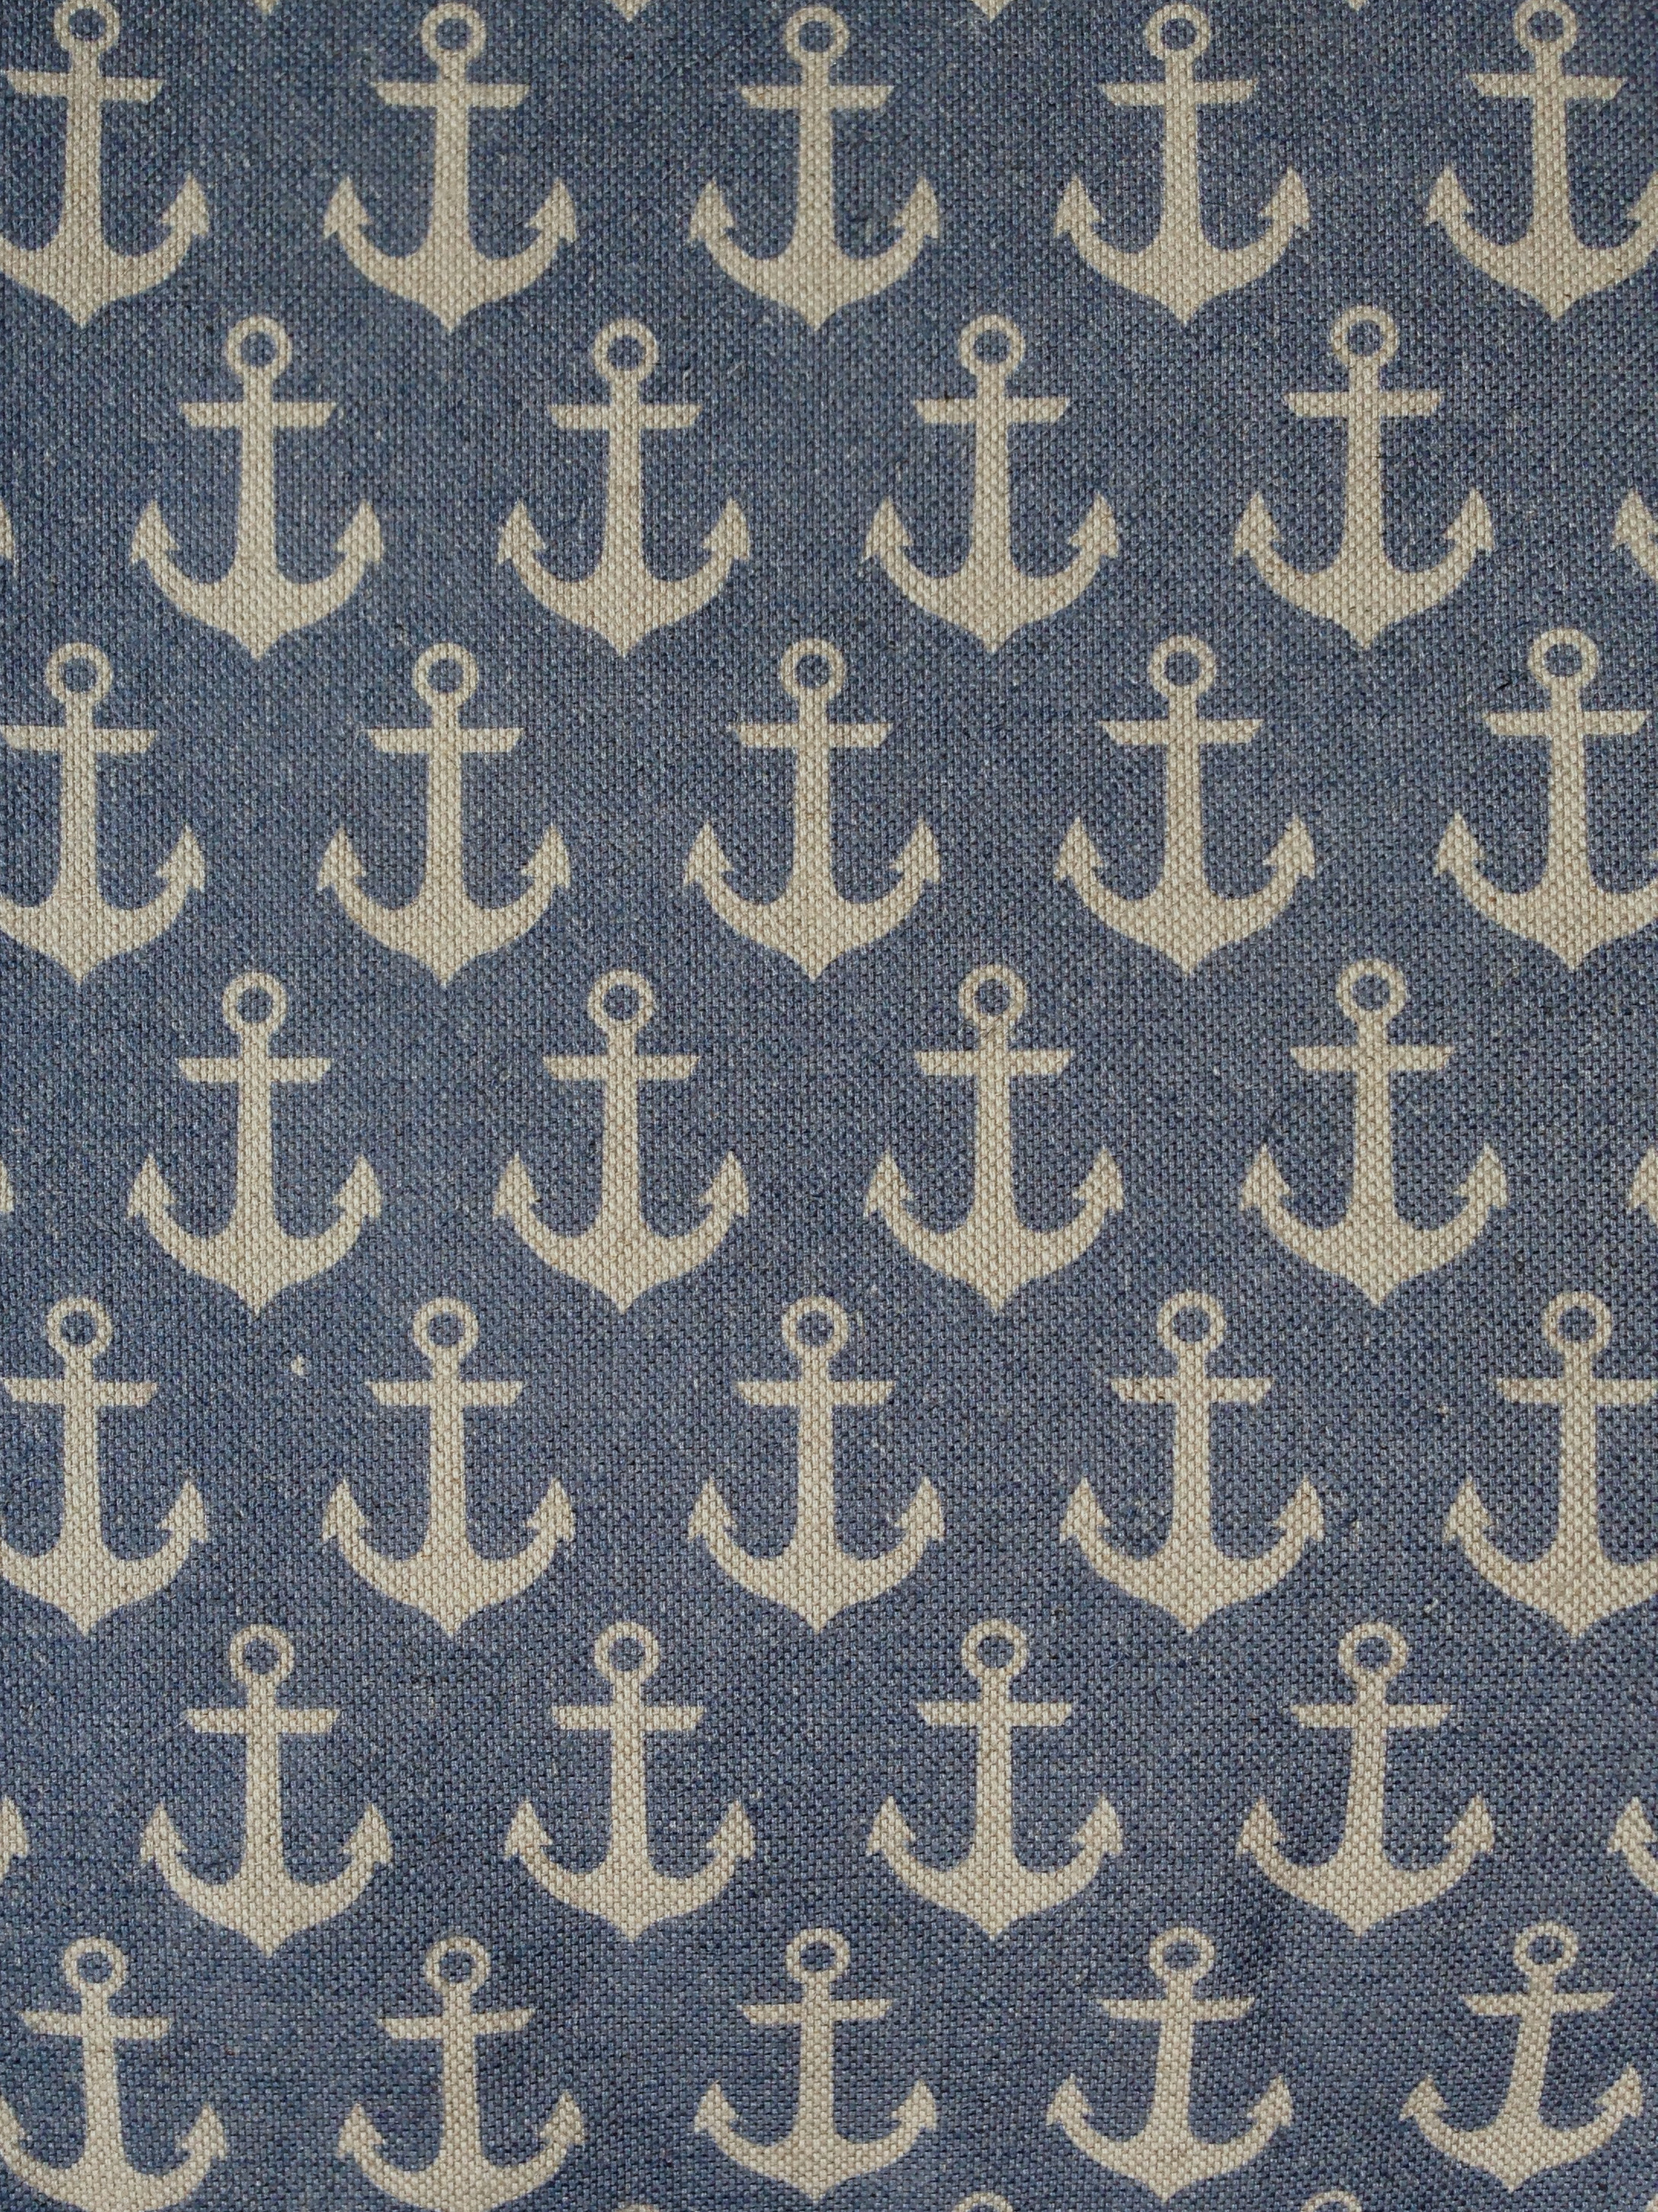 anchors denim